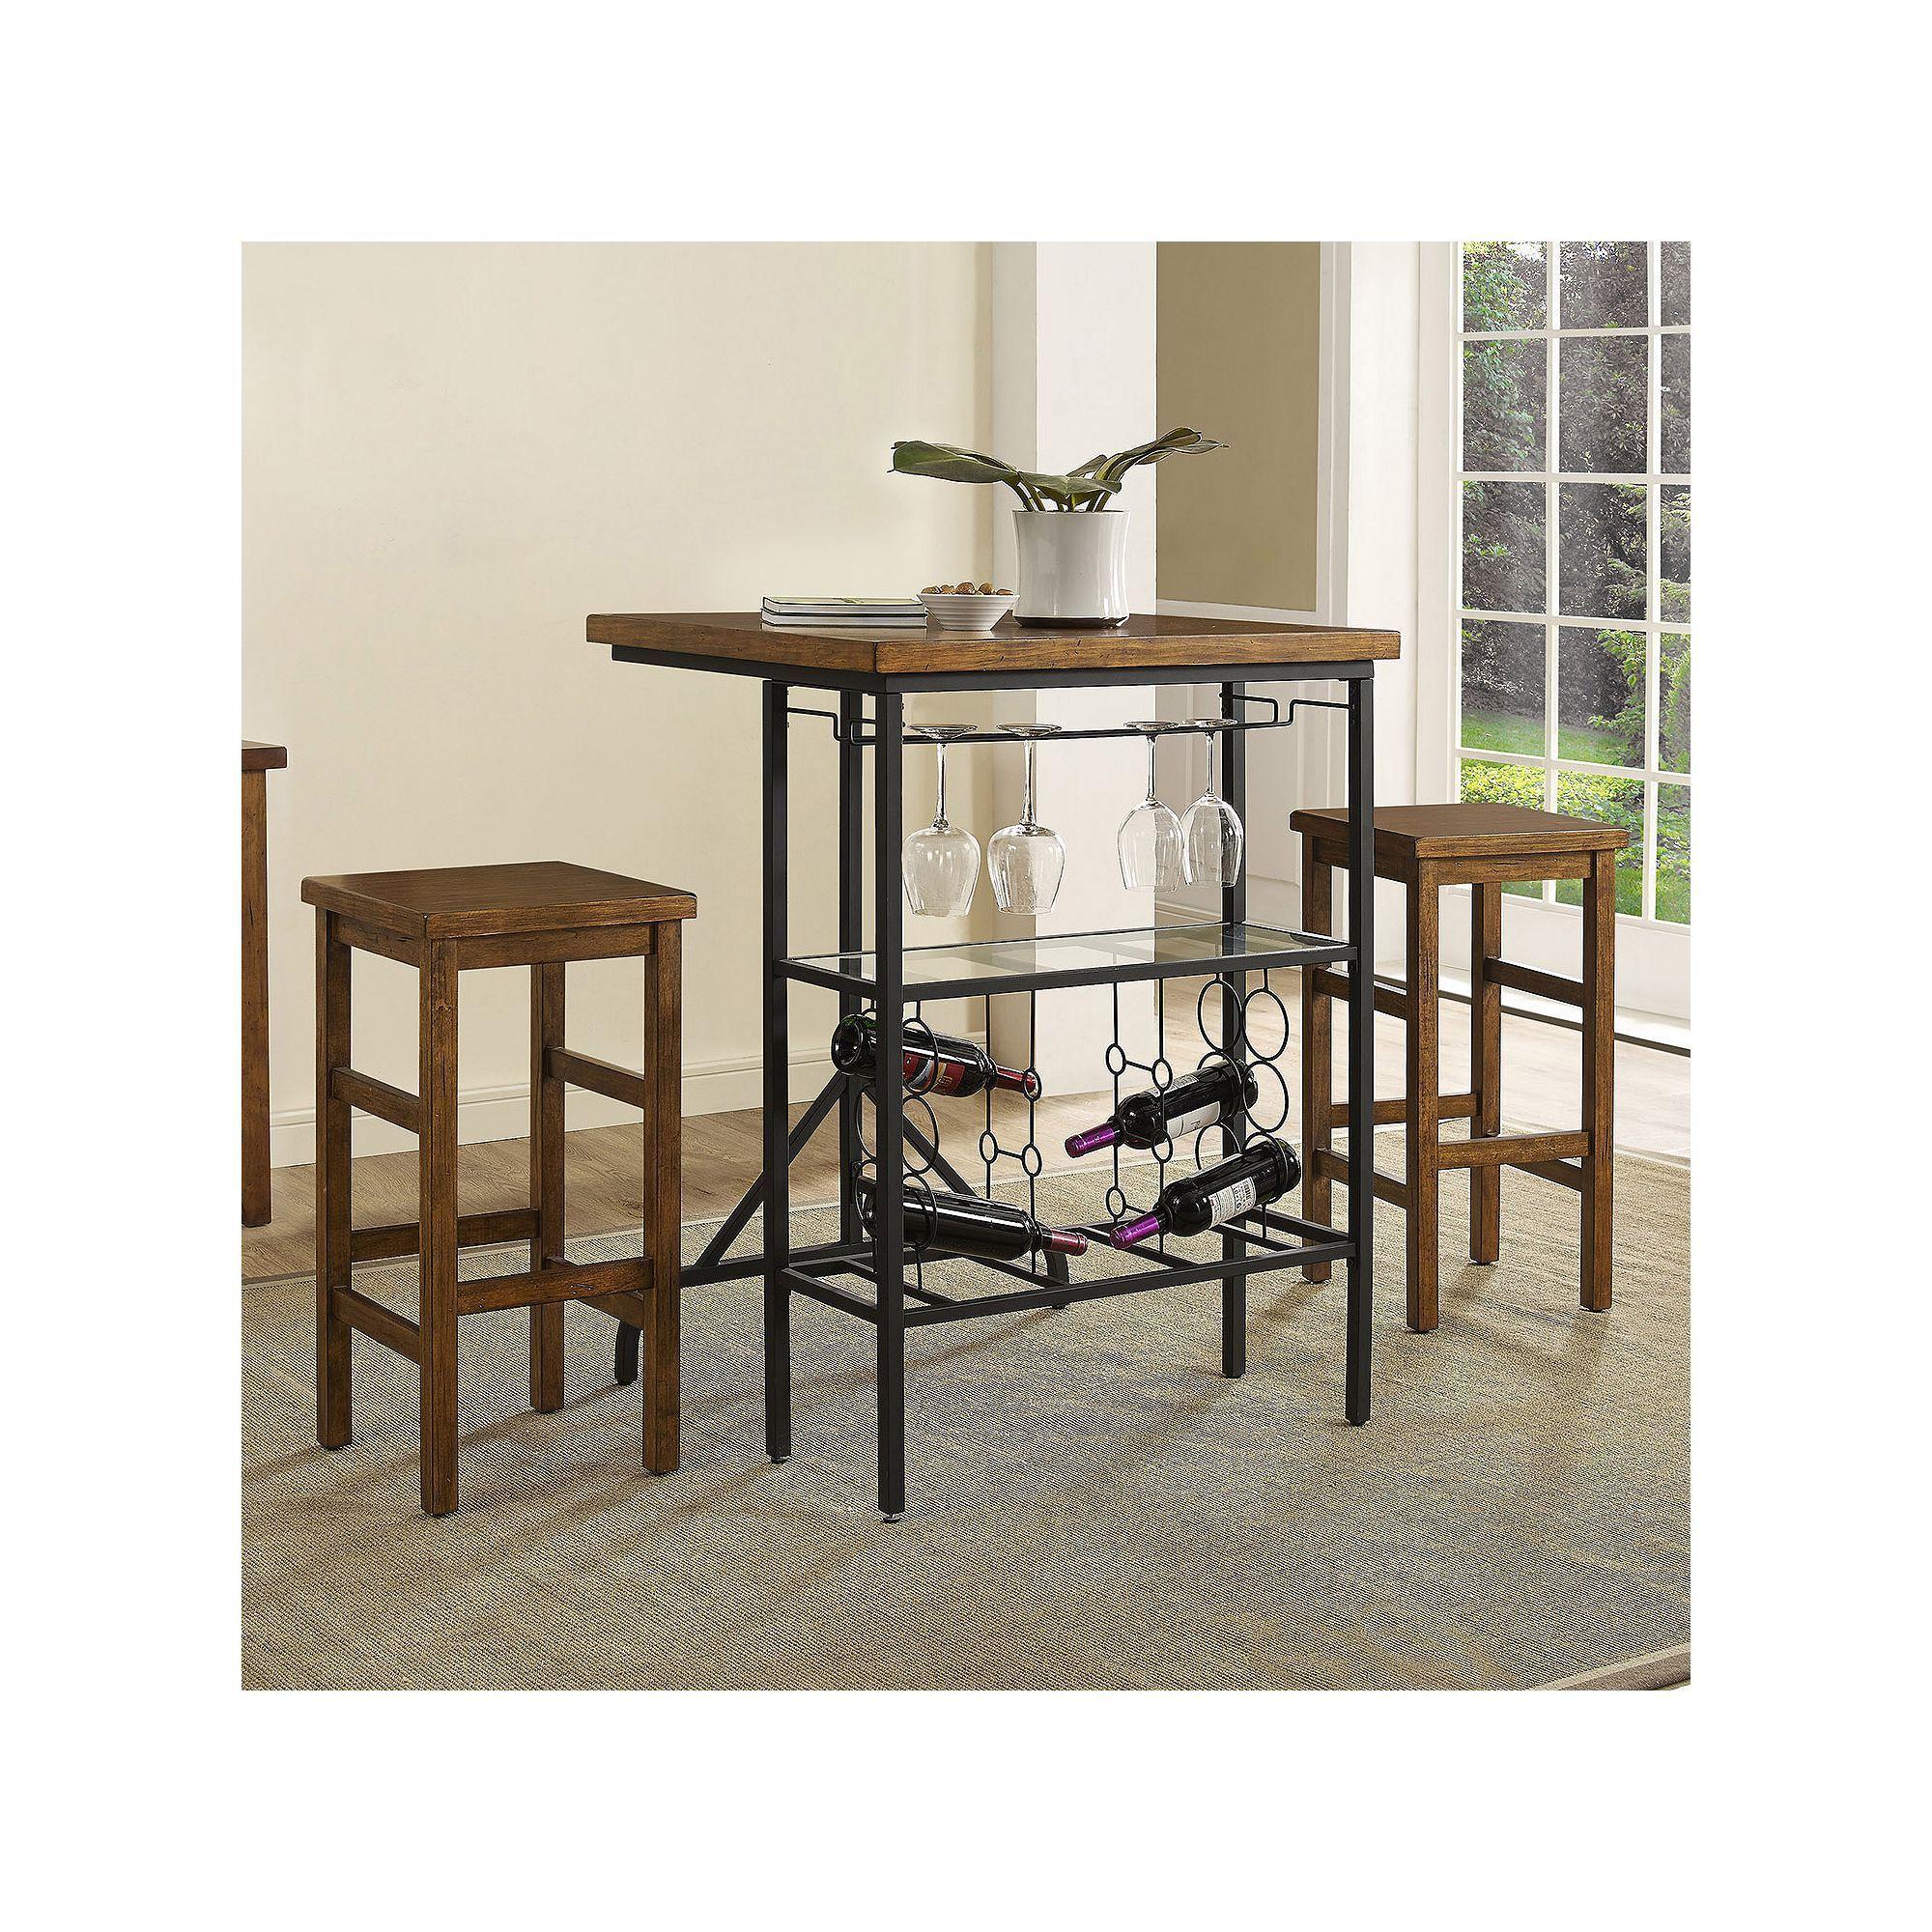 Crosley Furniture Sienna Wine Rack Bistro Table Bar Stool 3 Piece